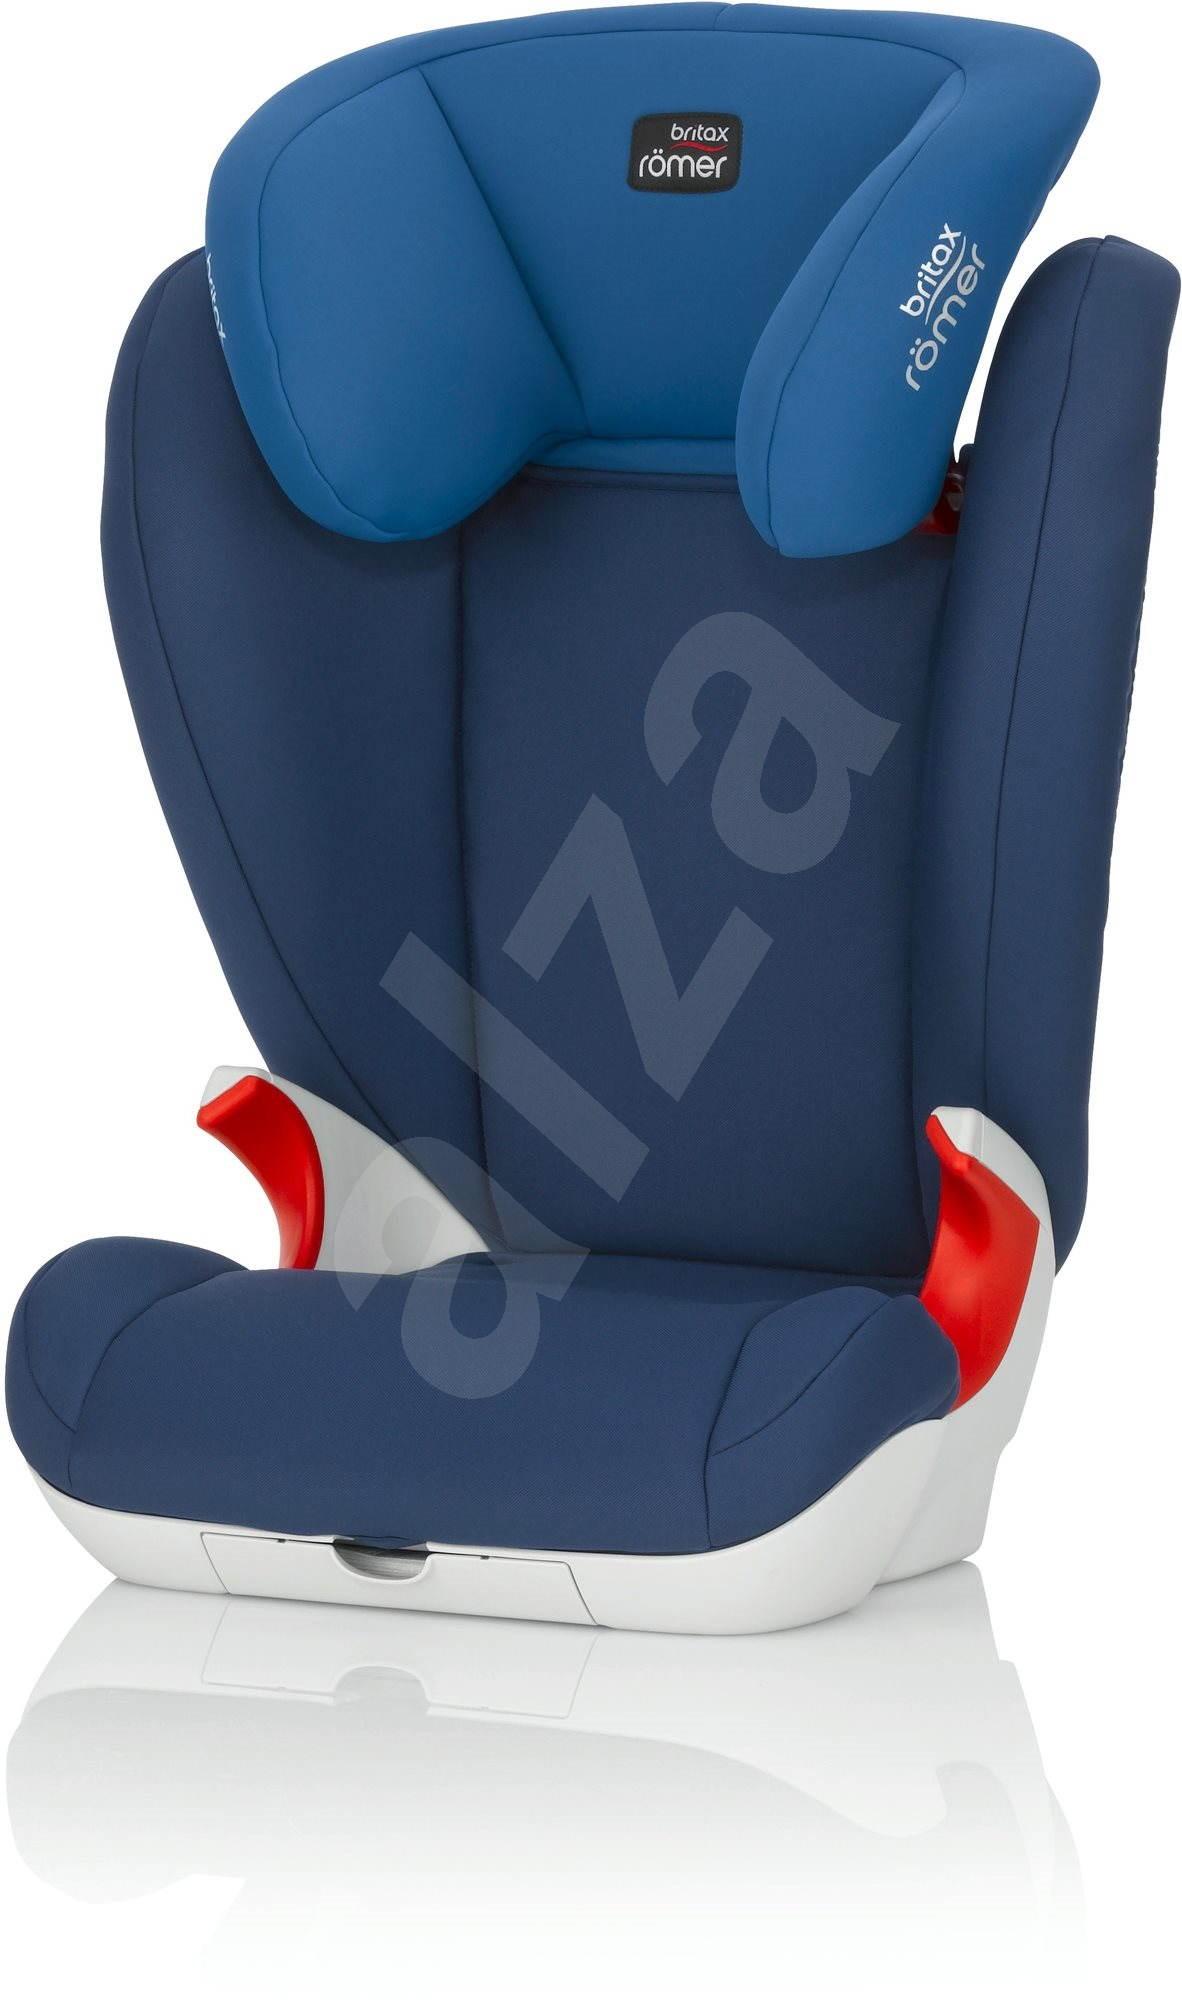 britax r mer kid ii ocean blue autoseda ka. Black Bedroom Furniture Sets. Home Design Ideas